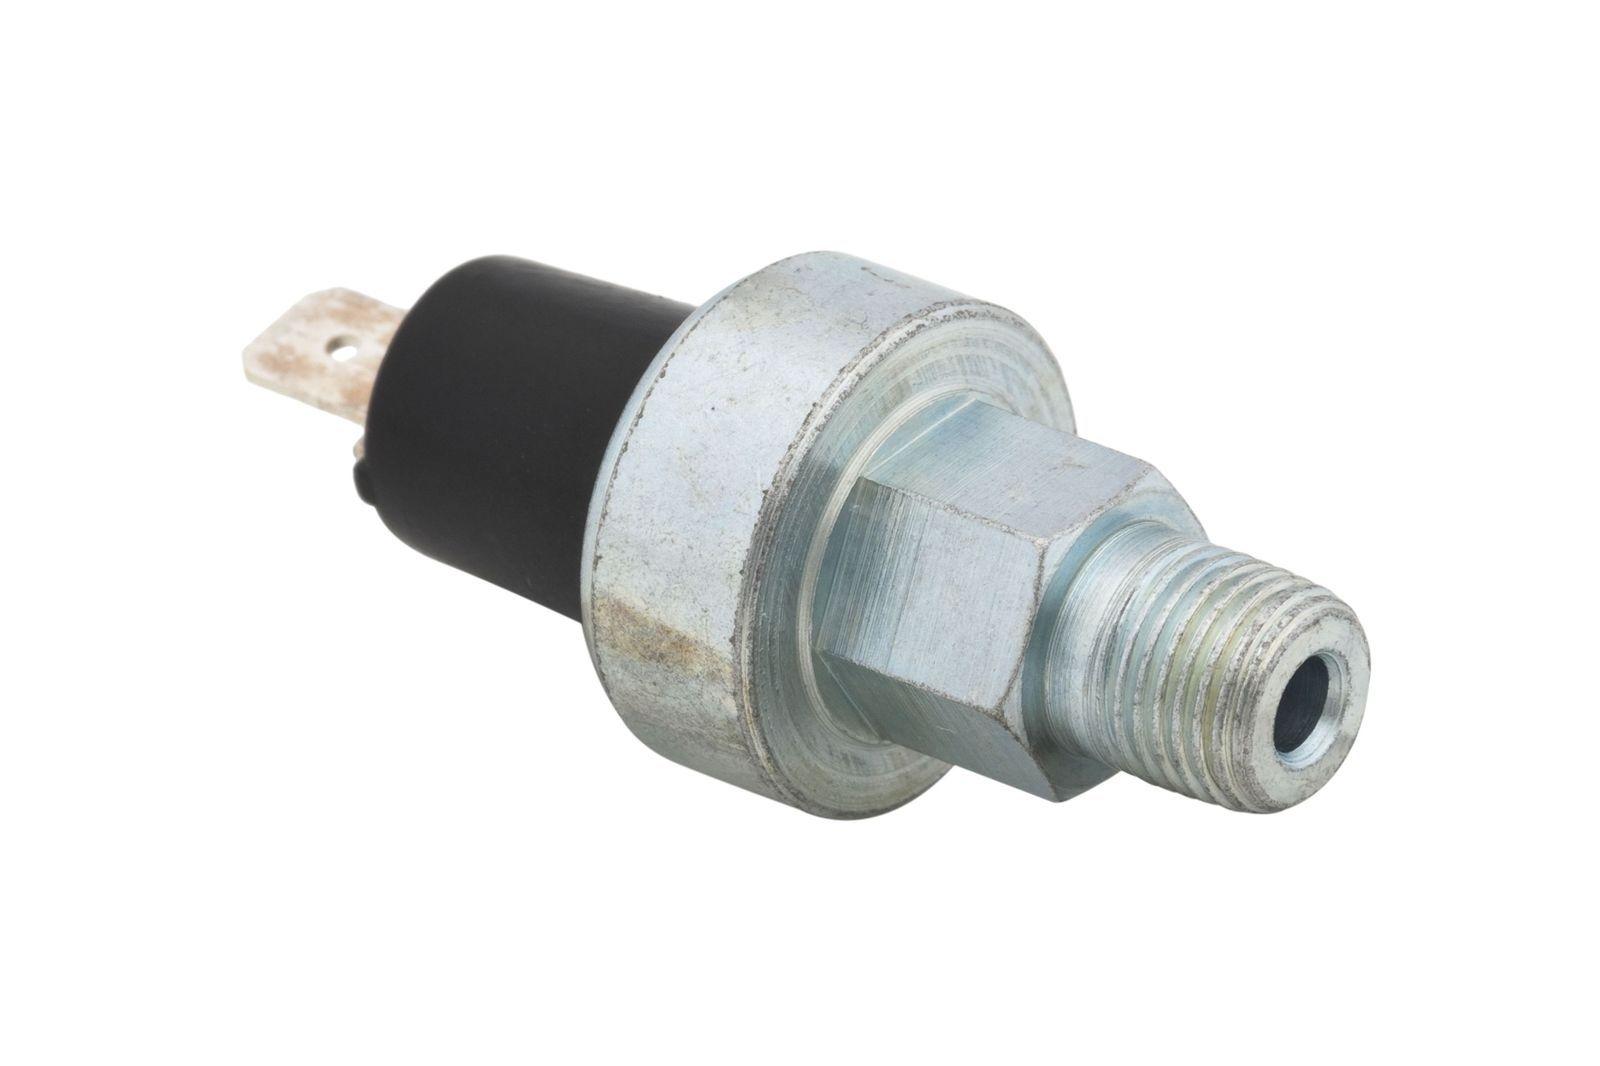 #3301-32 Geber Öldruckschalter Triumph Spitfire, GPS0117